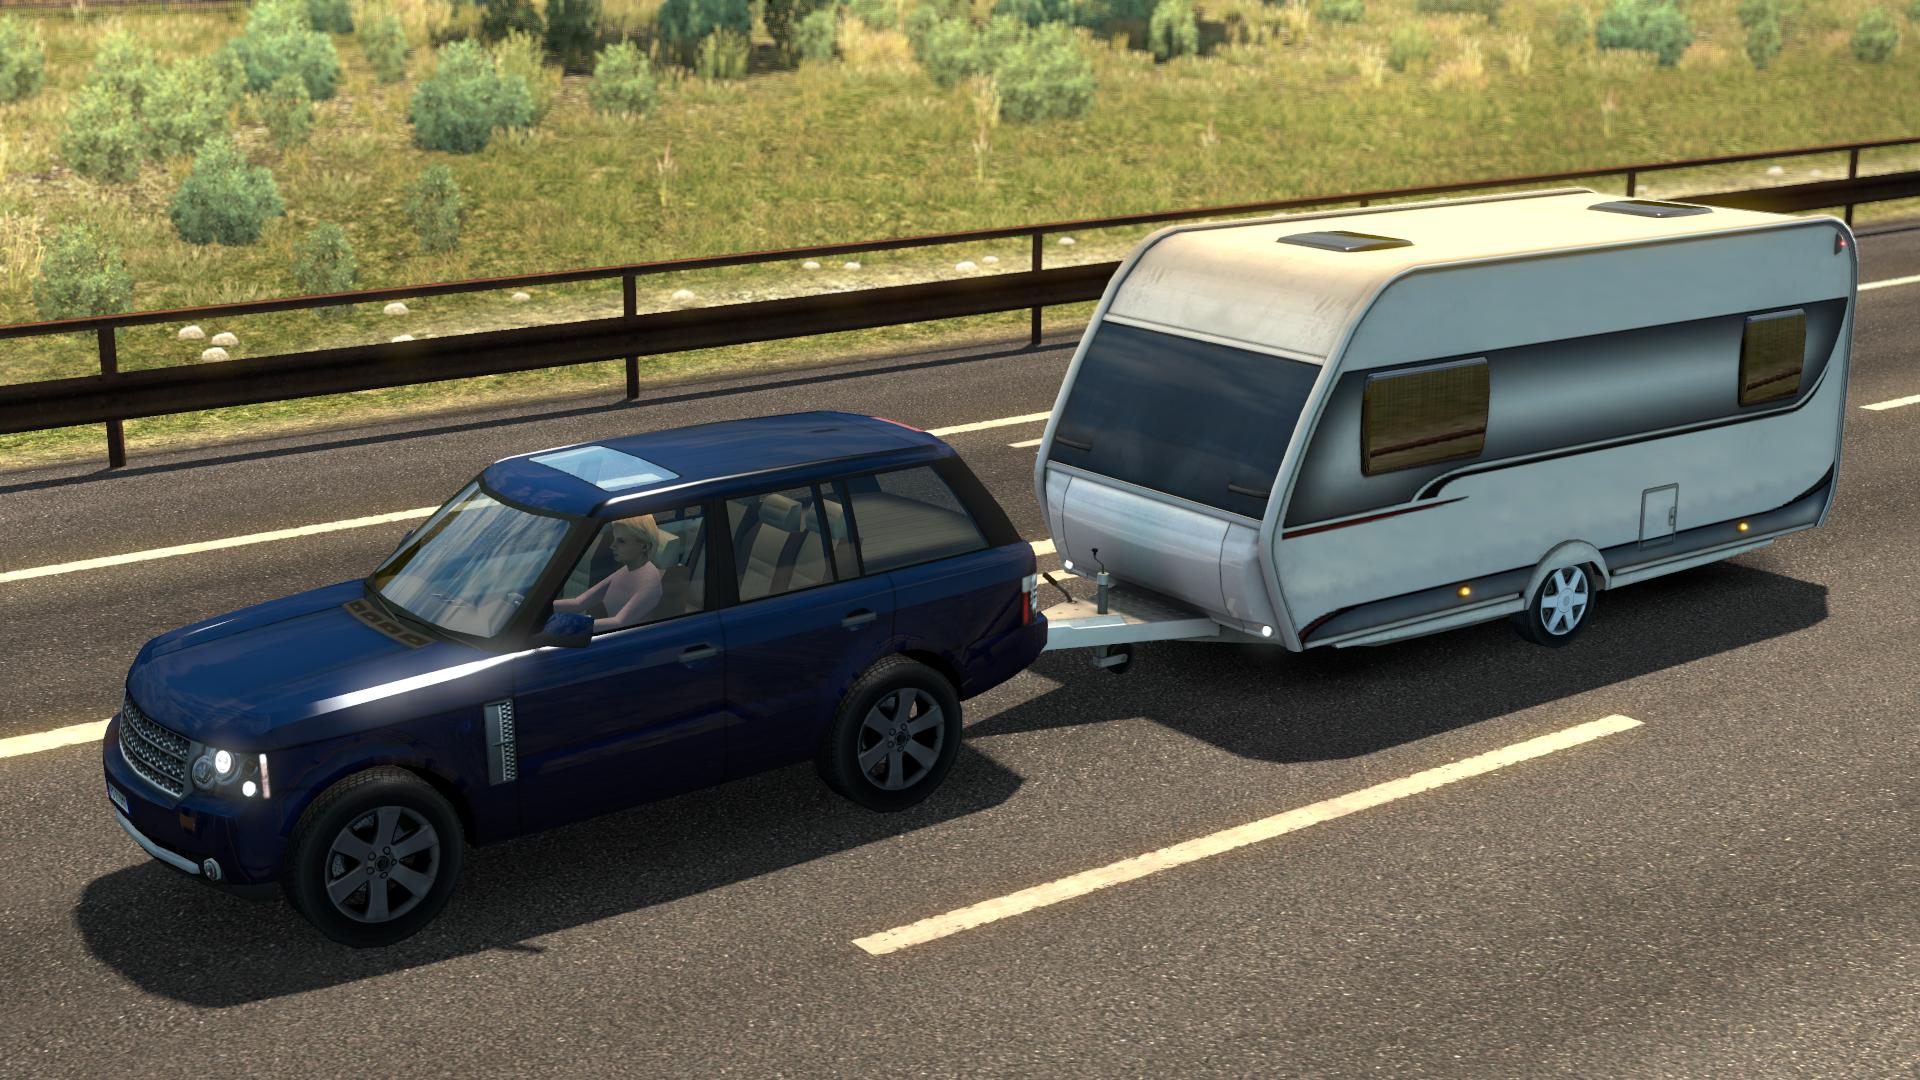 Image Ets2 Land Rover Range Rover Caravan